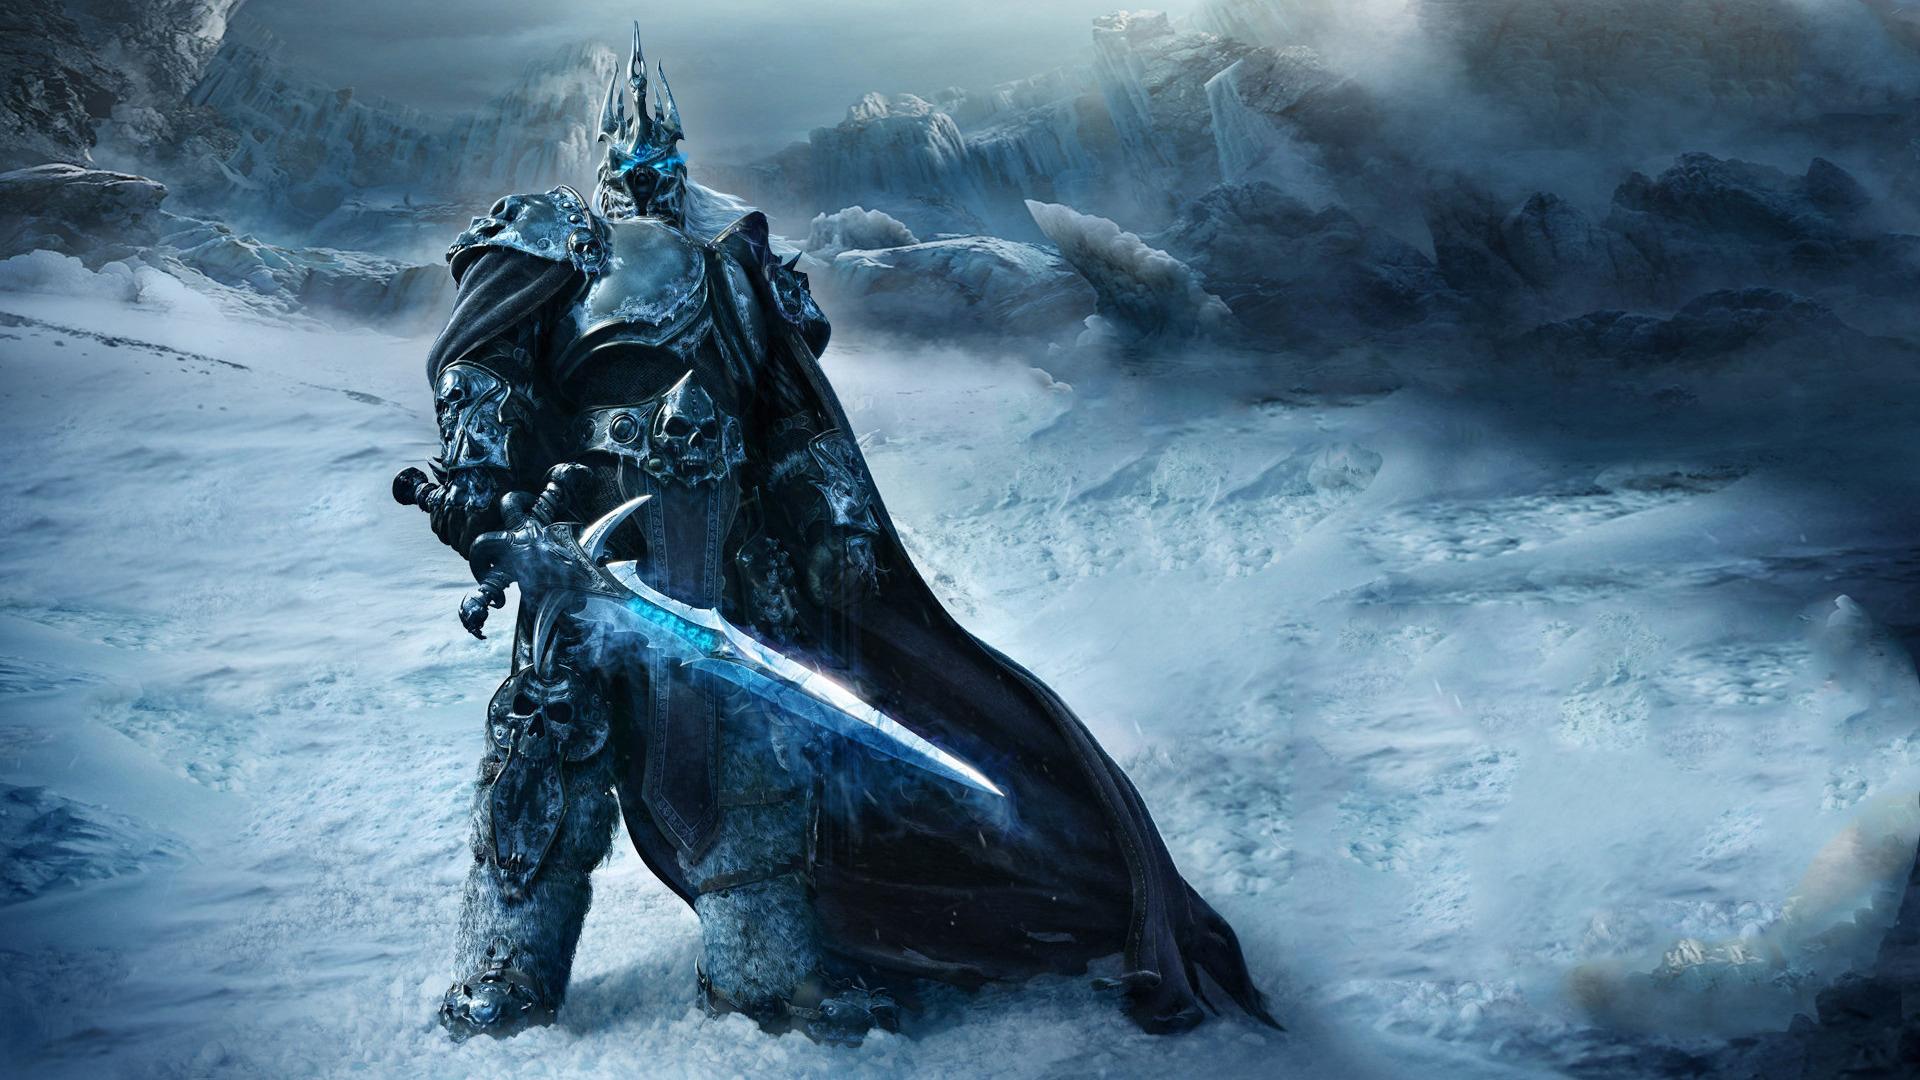 world_of_warcraft_wrath_of_the_lich_king-HD.jpg